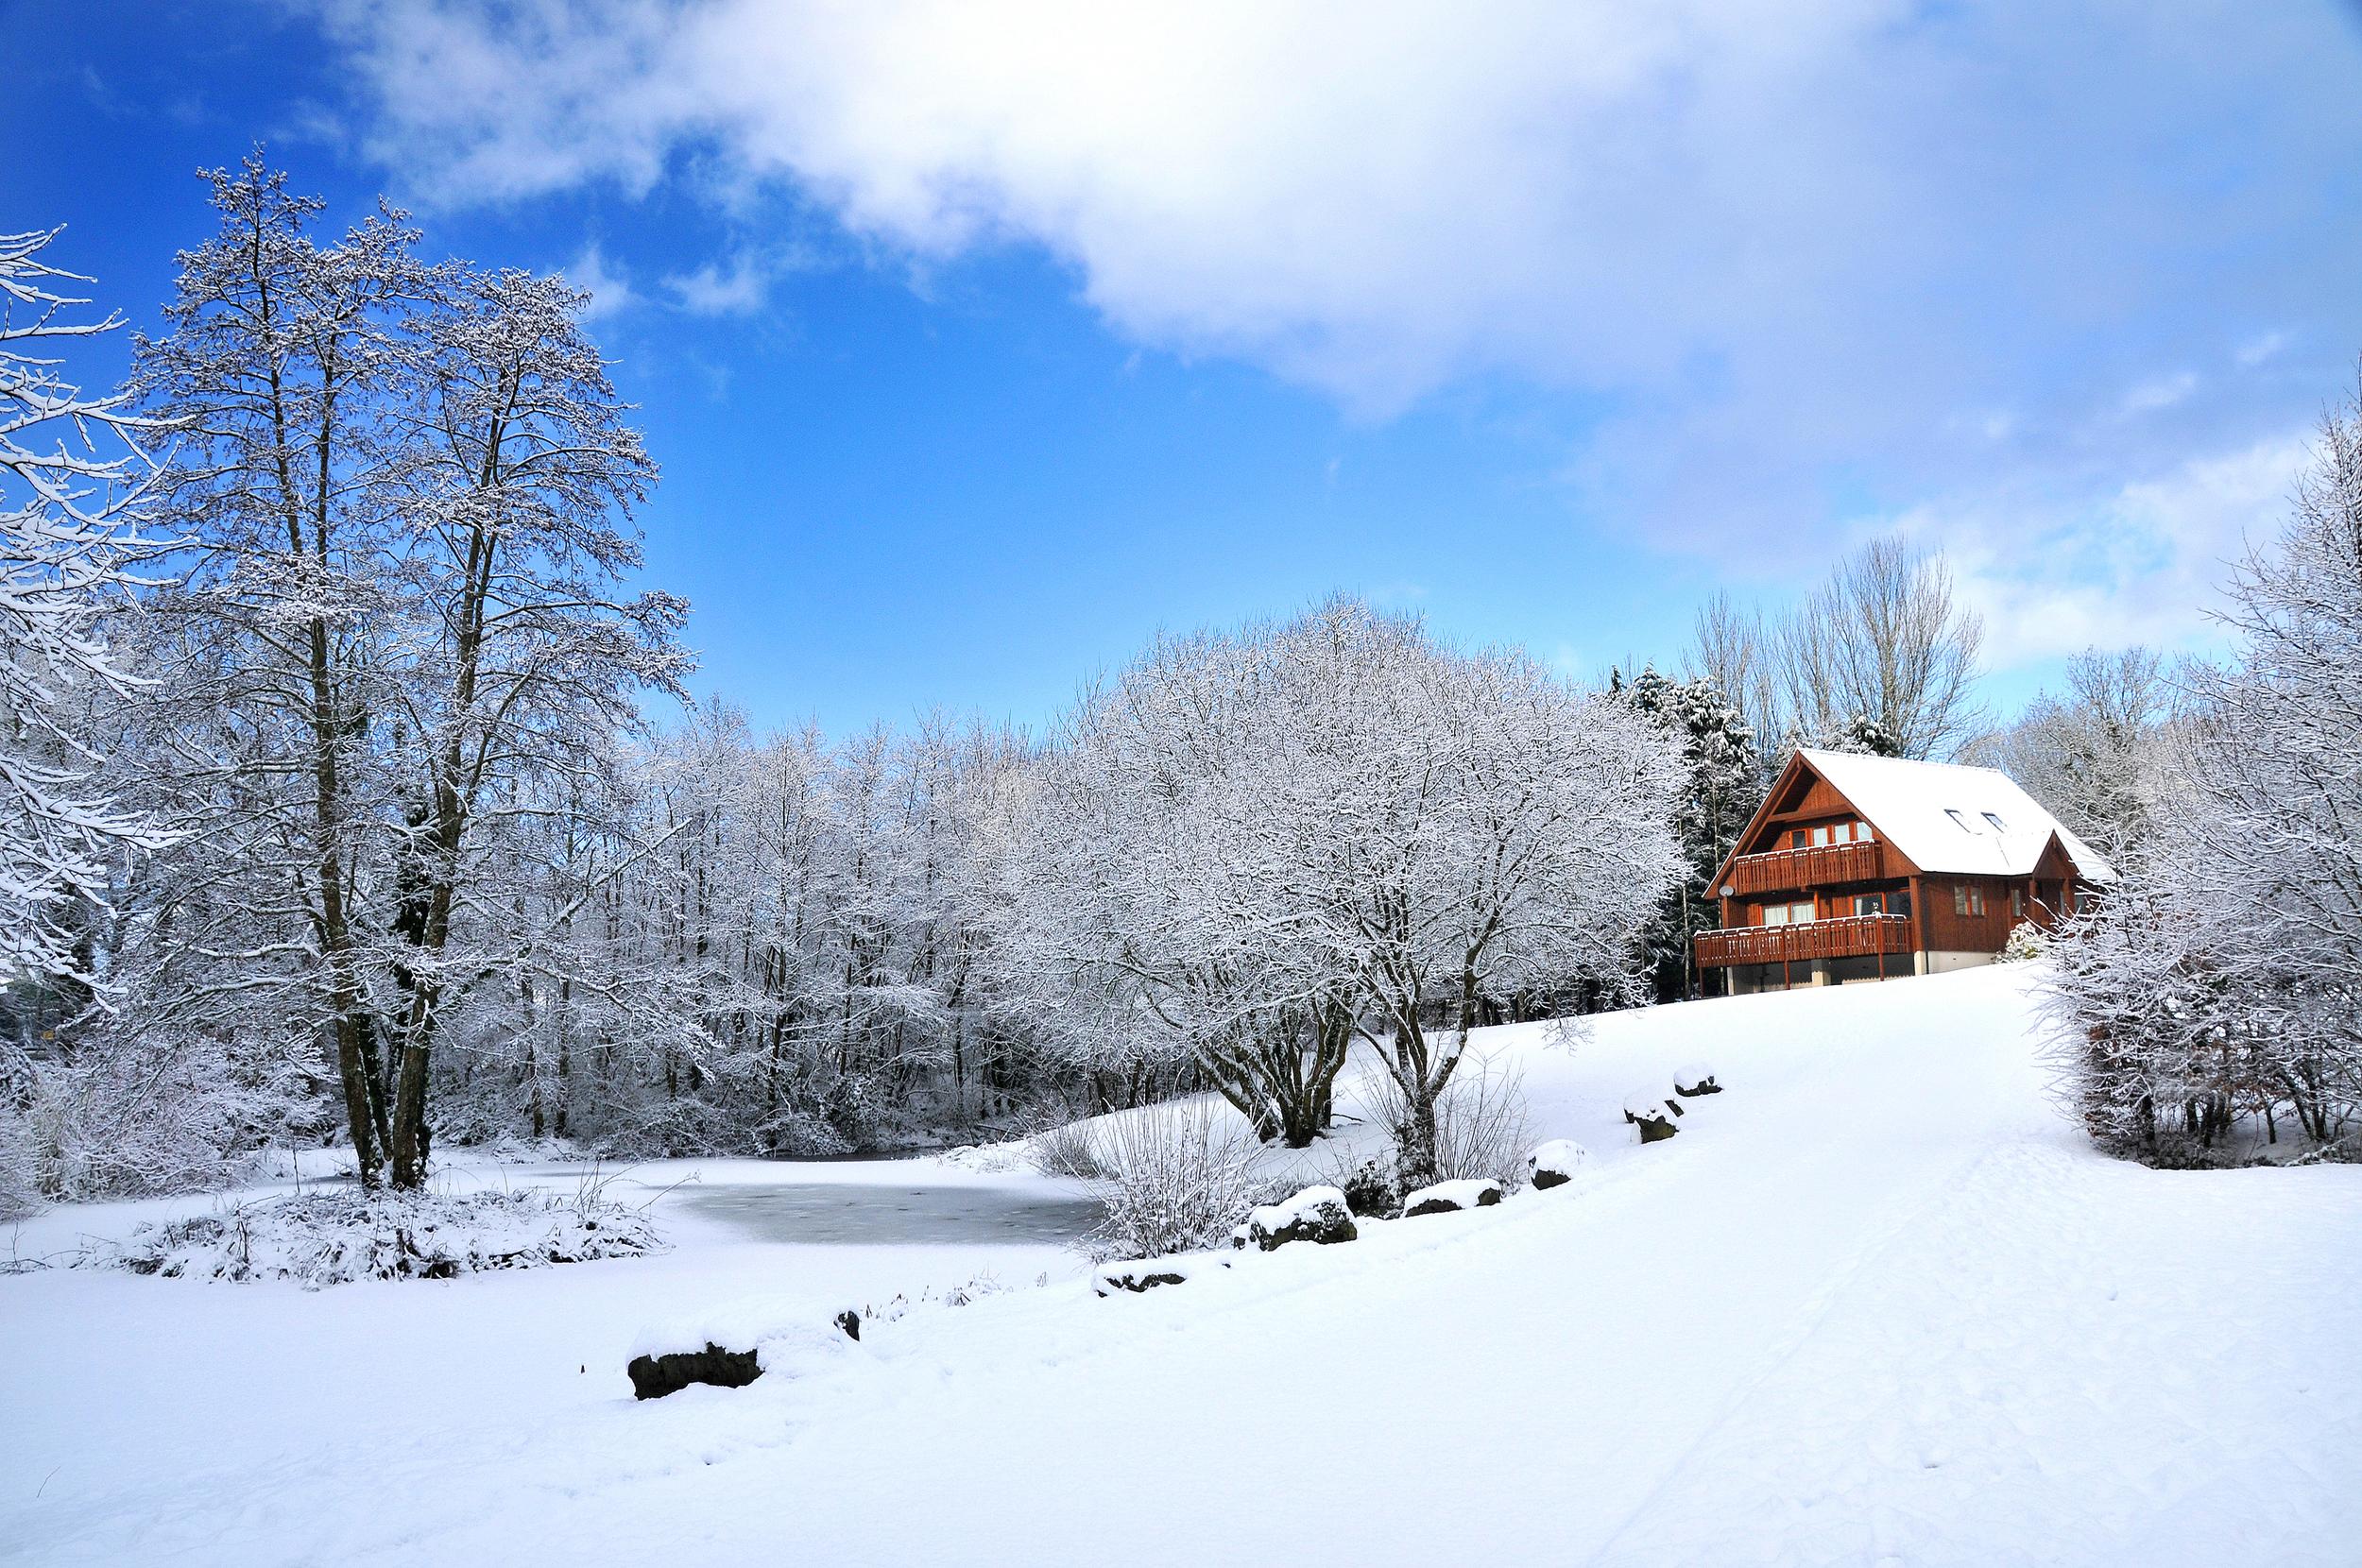 Snow and the house1.jpg